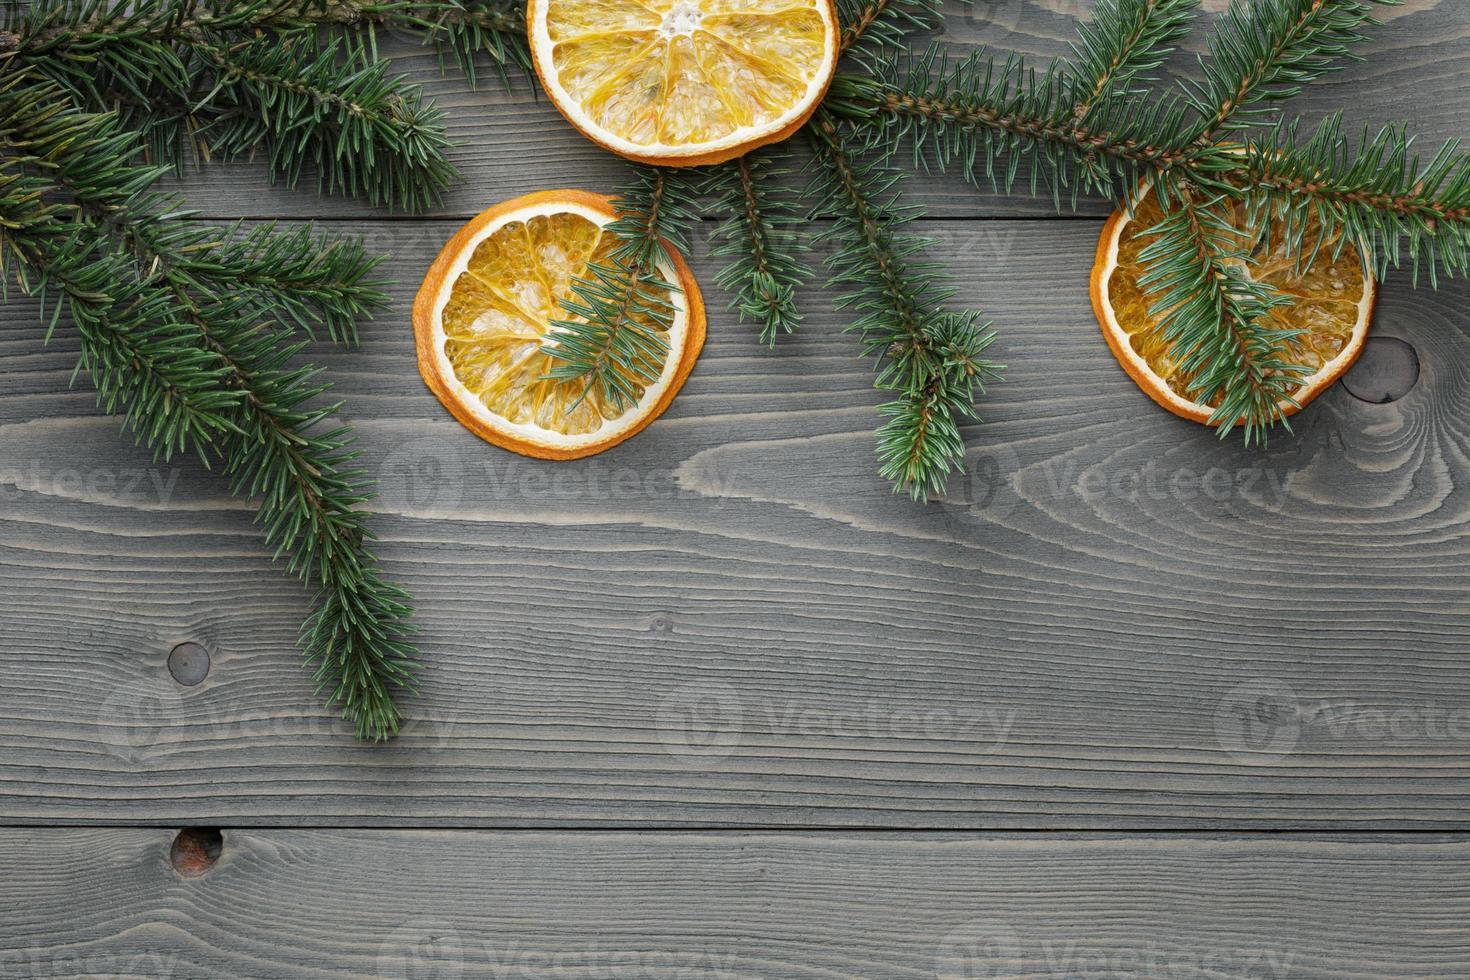 spruce twig with dried orange slices photo